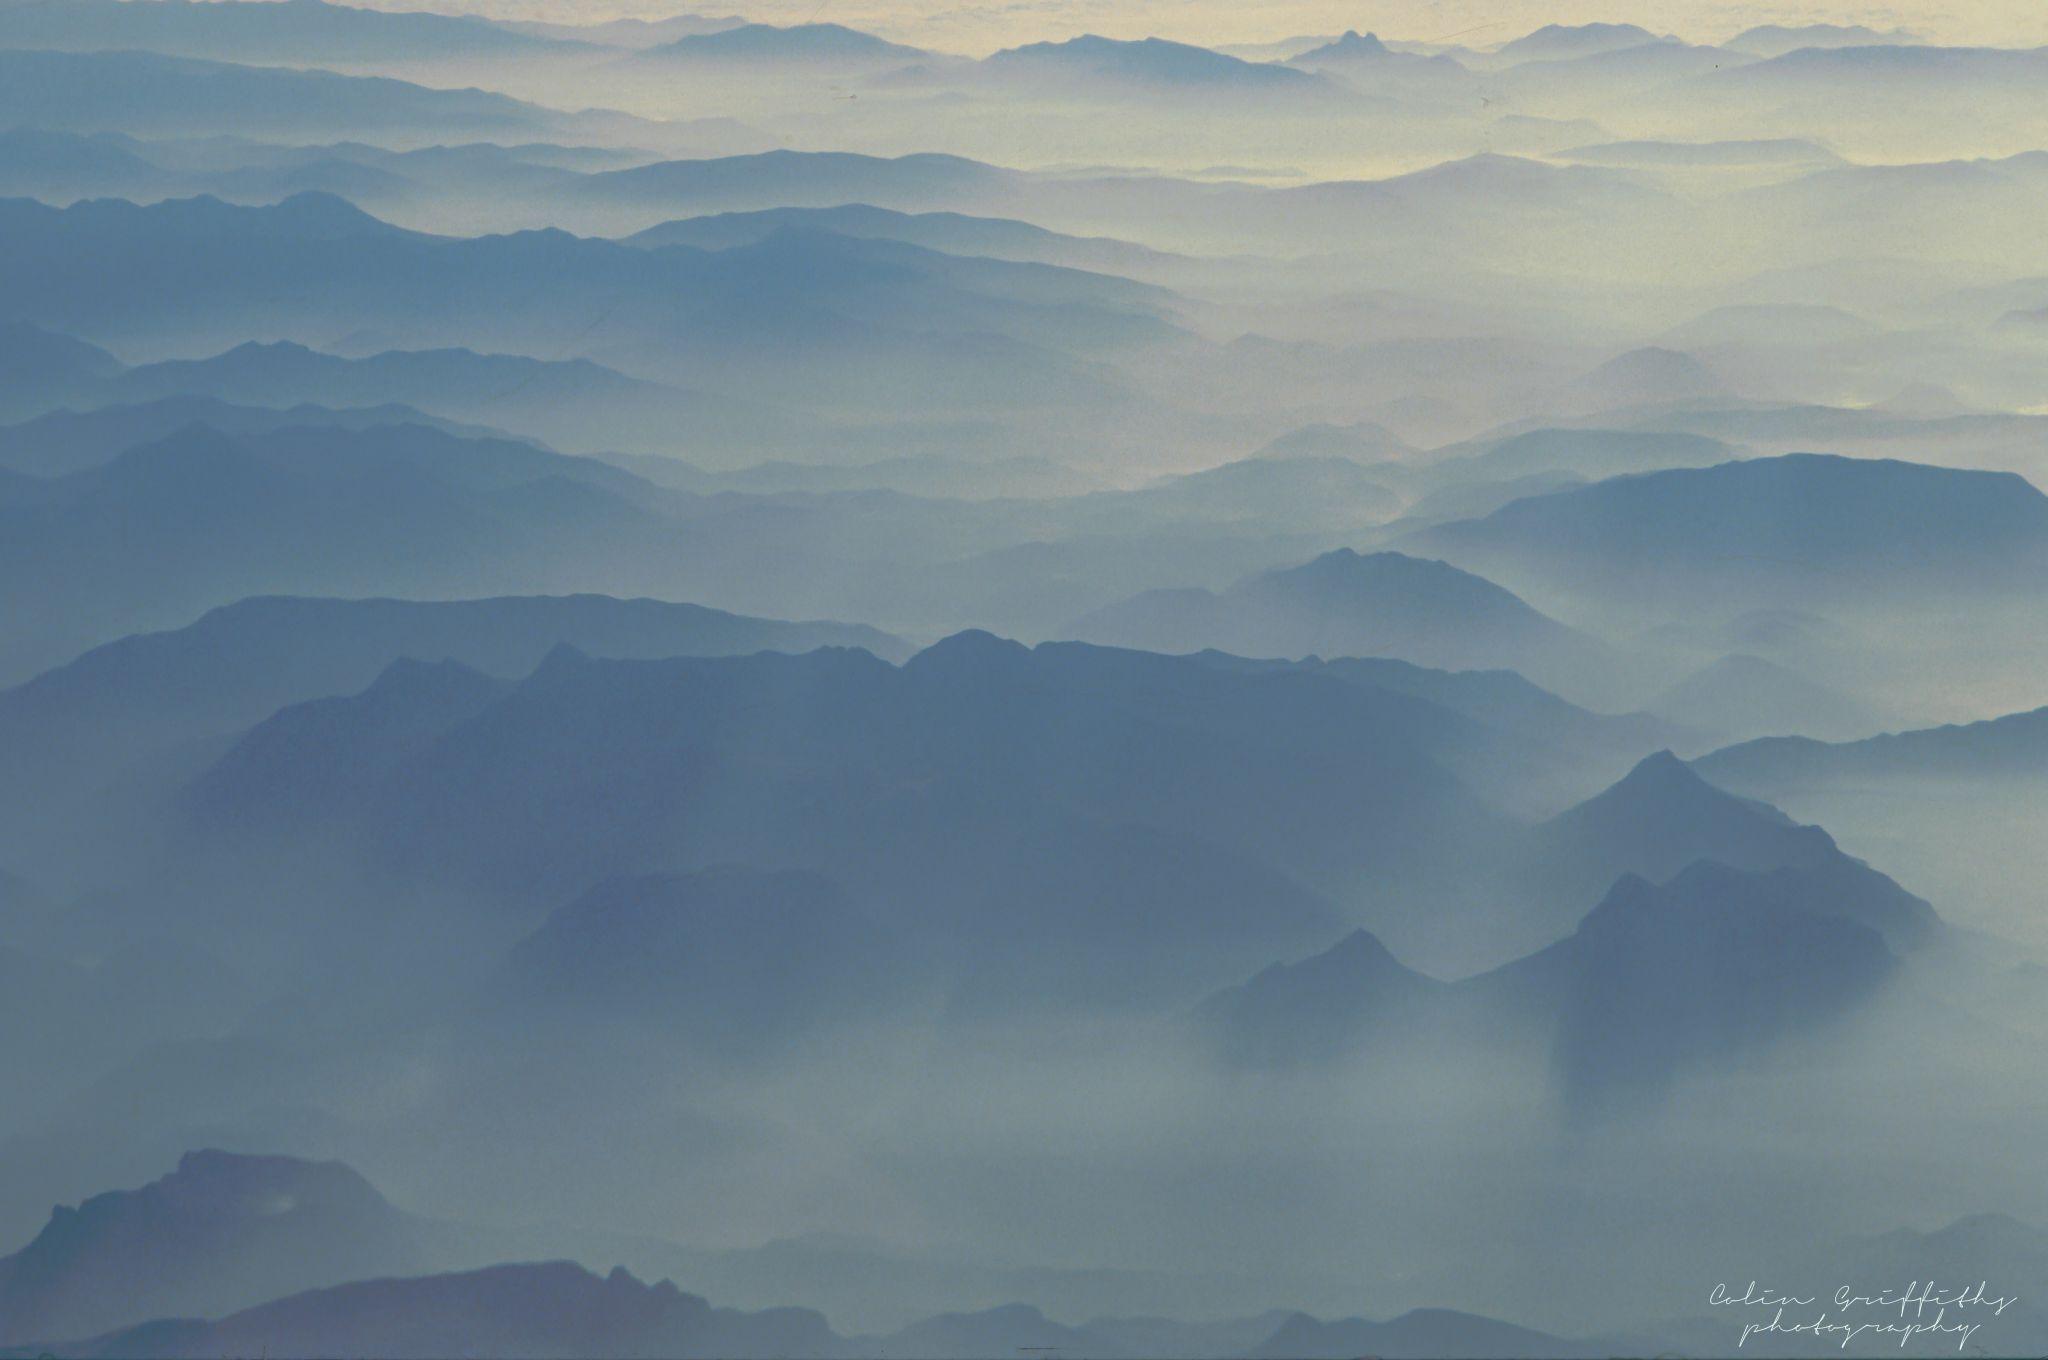 Swiss misty morning, Switzerland